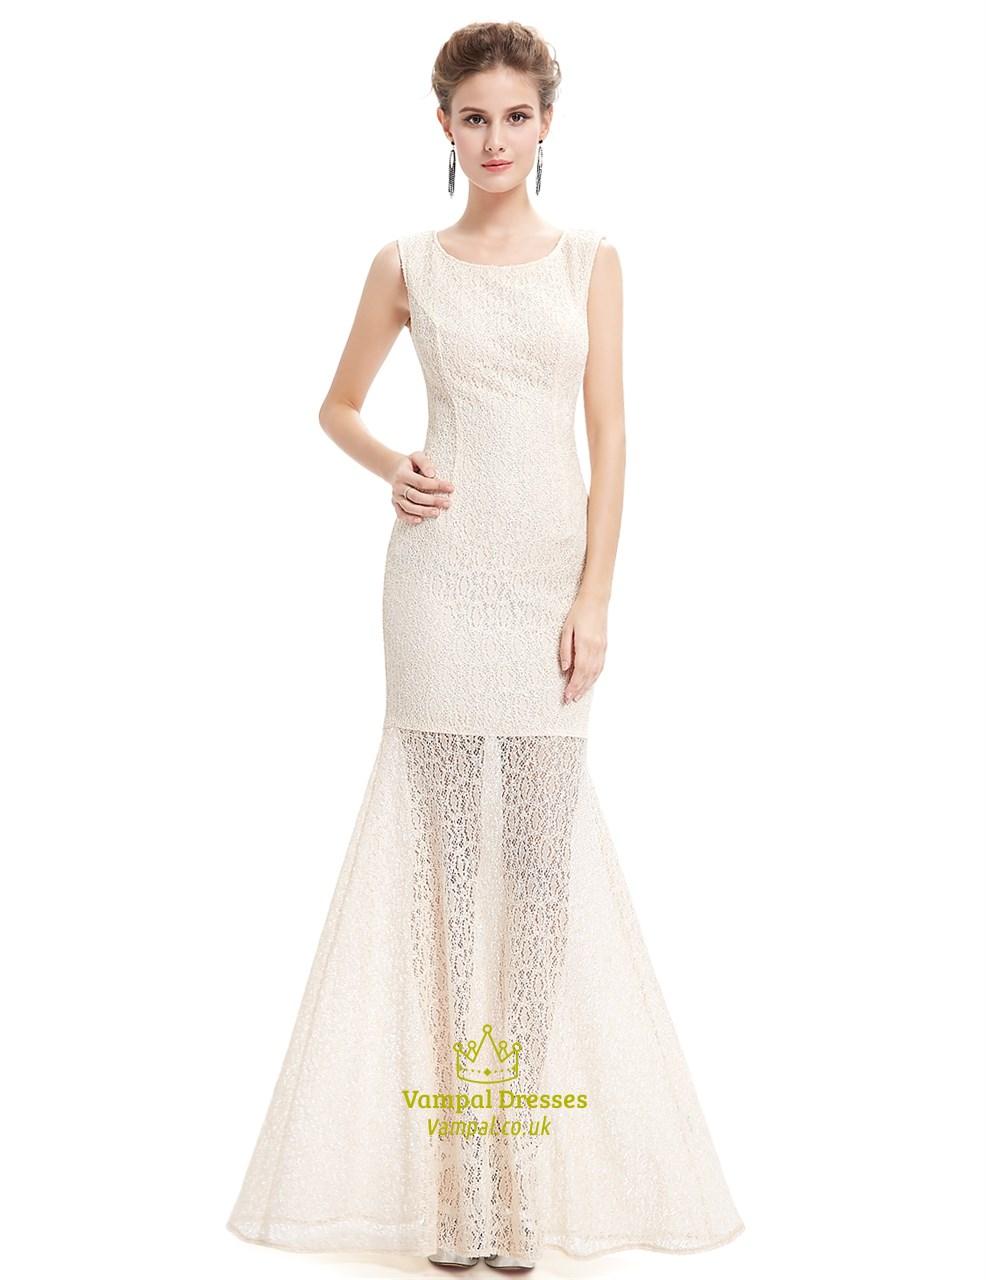 ec2b9120d94 Elegant Chagne Sheath Lace Prom Dress With Sheer Illusion Skirt Sku Nw1607